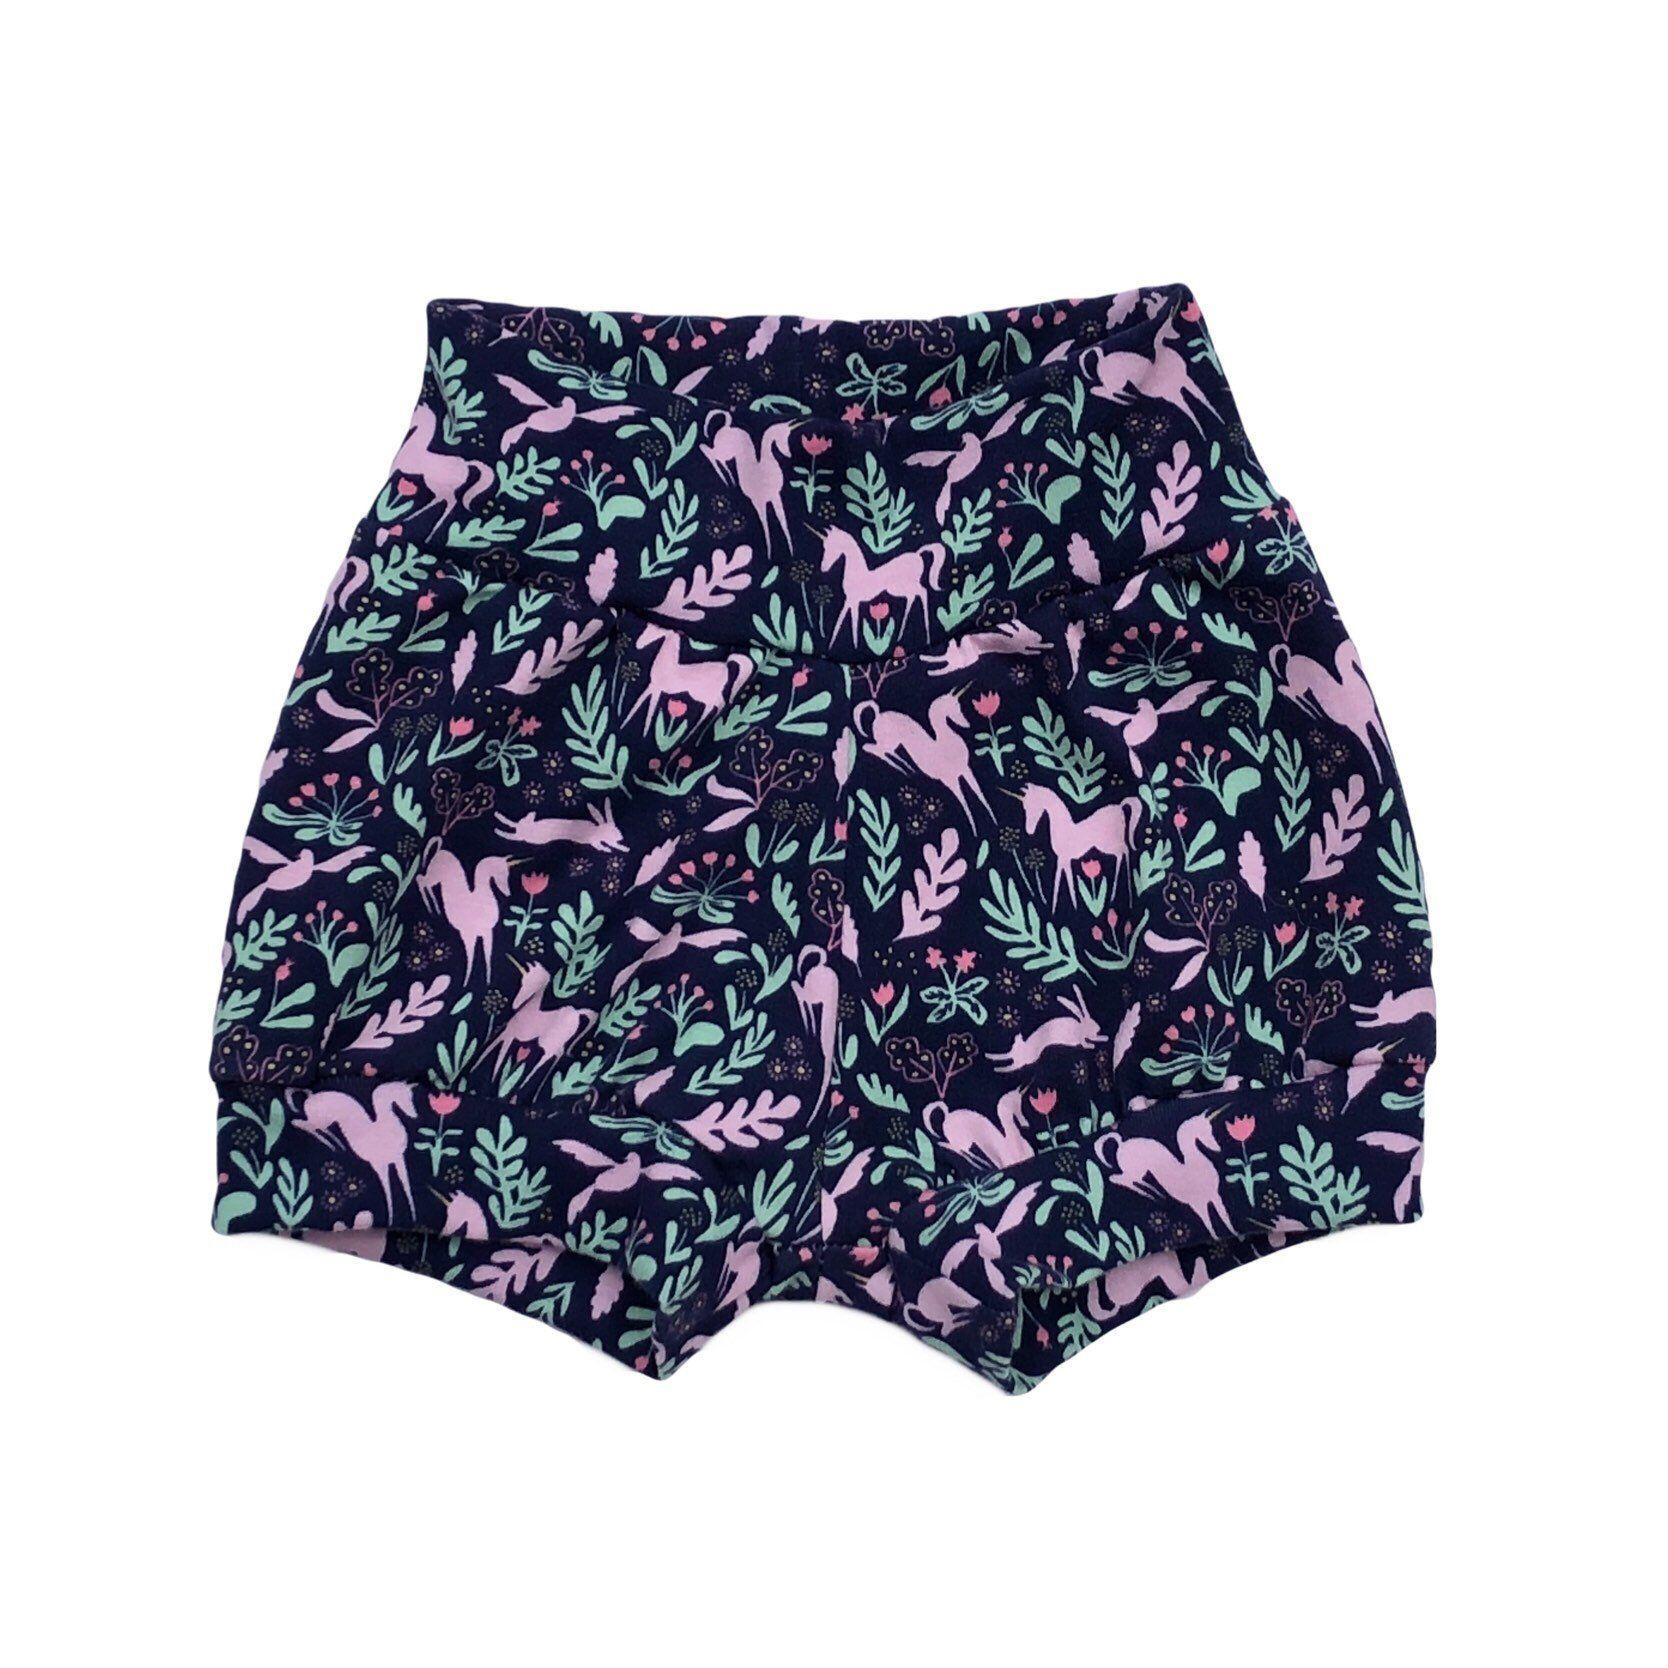 Magical Unicorn Shorties - kid shorts - Handmade Toddler shorts - Girl shorties - Baby Toddler Kid #toddlershorts